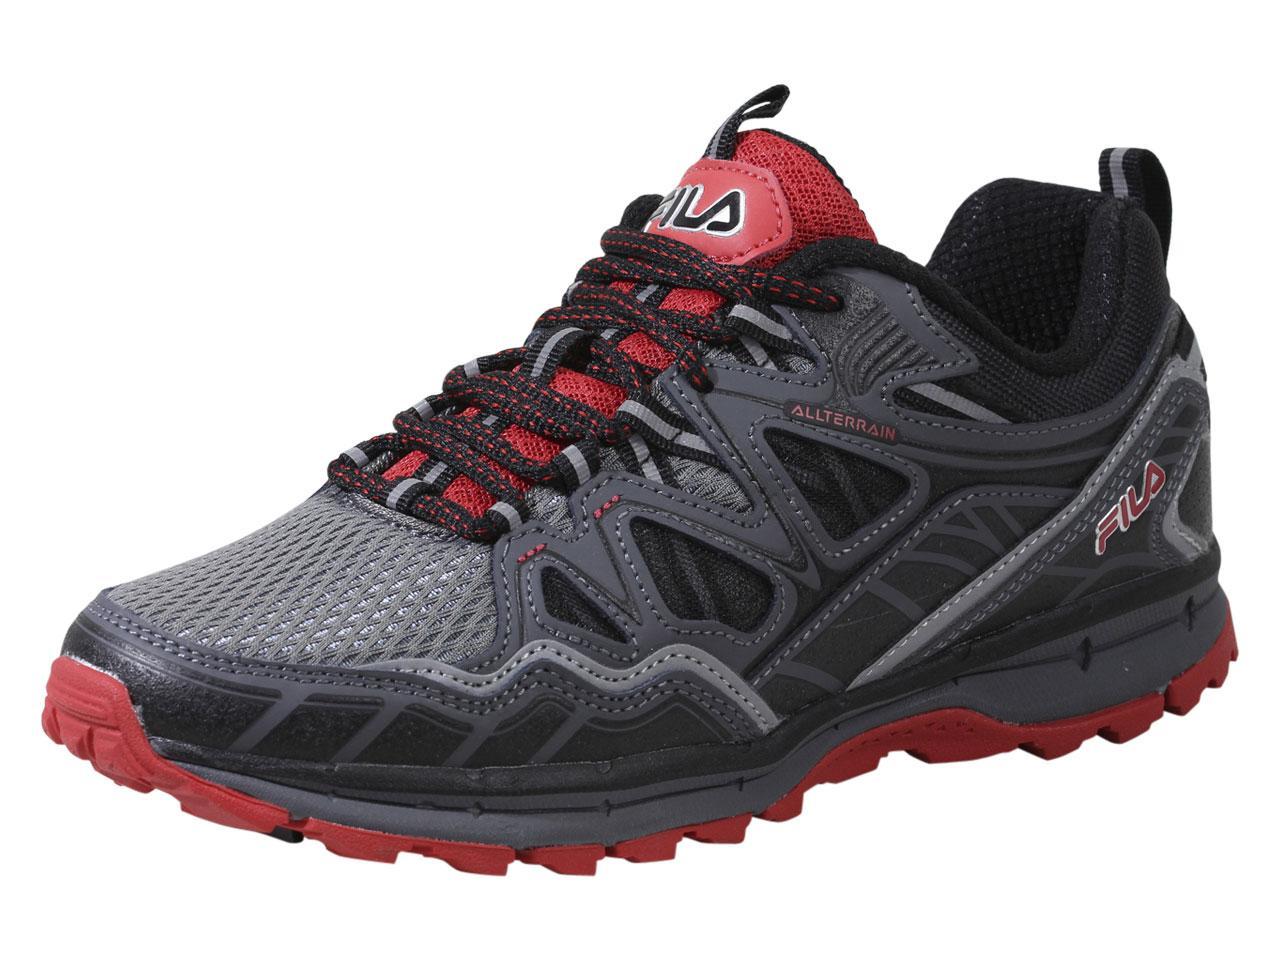 Fila Men's Memory TKO TR 5.0 Memory Foam Trail Running Sneakers Shoes